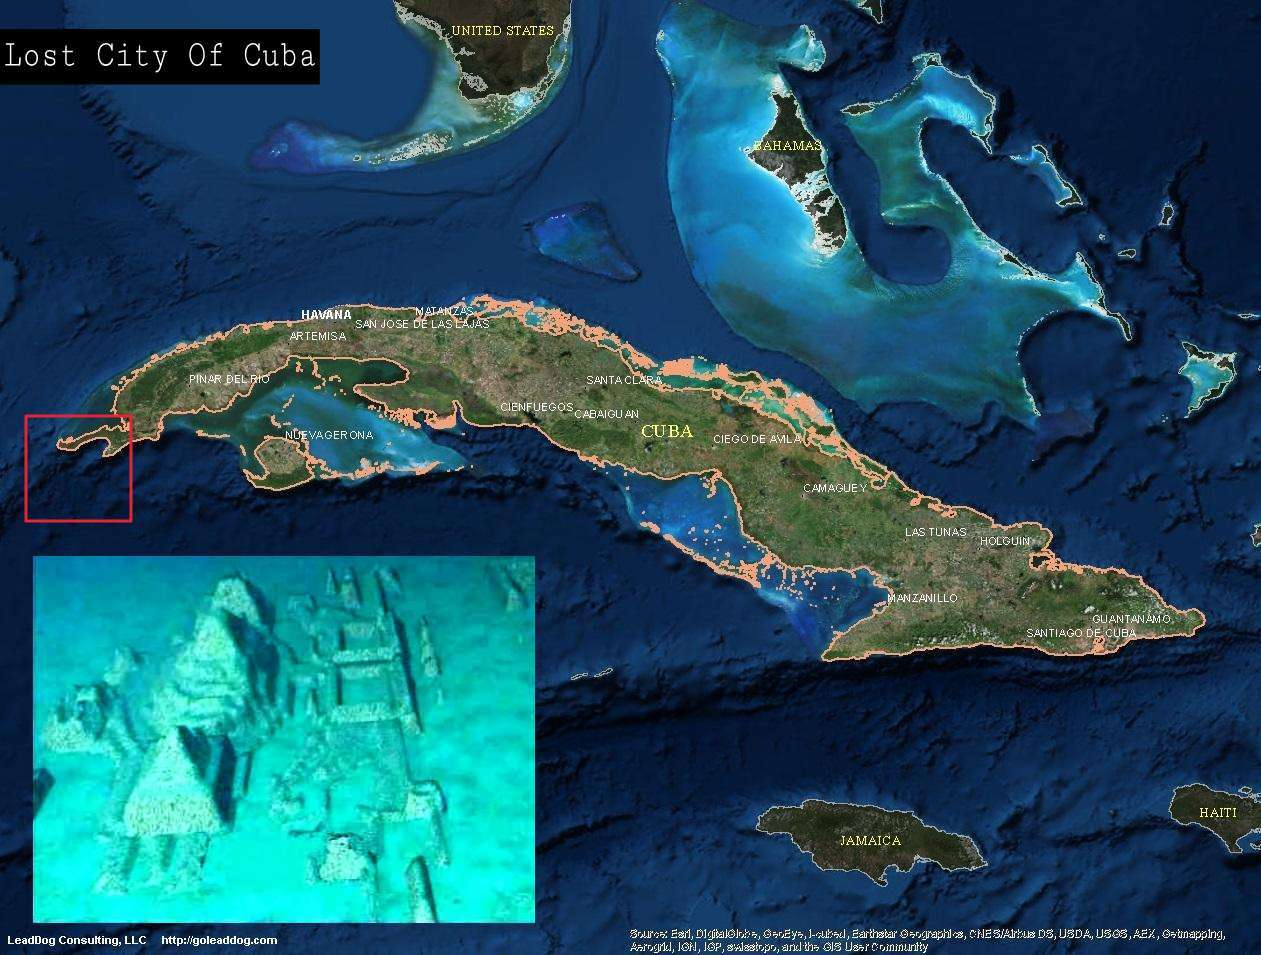 The Underwater City Of Cuba